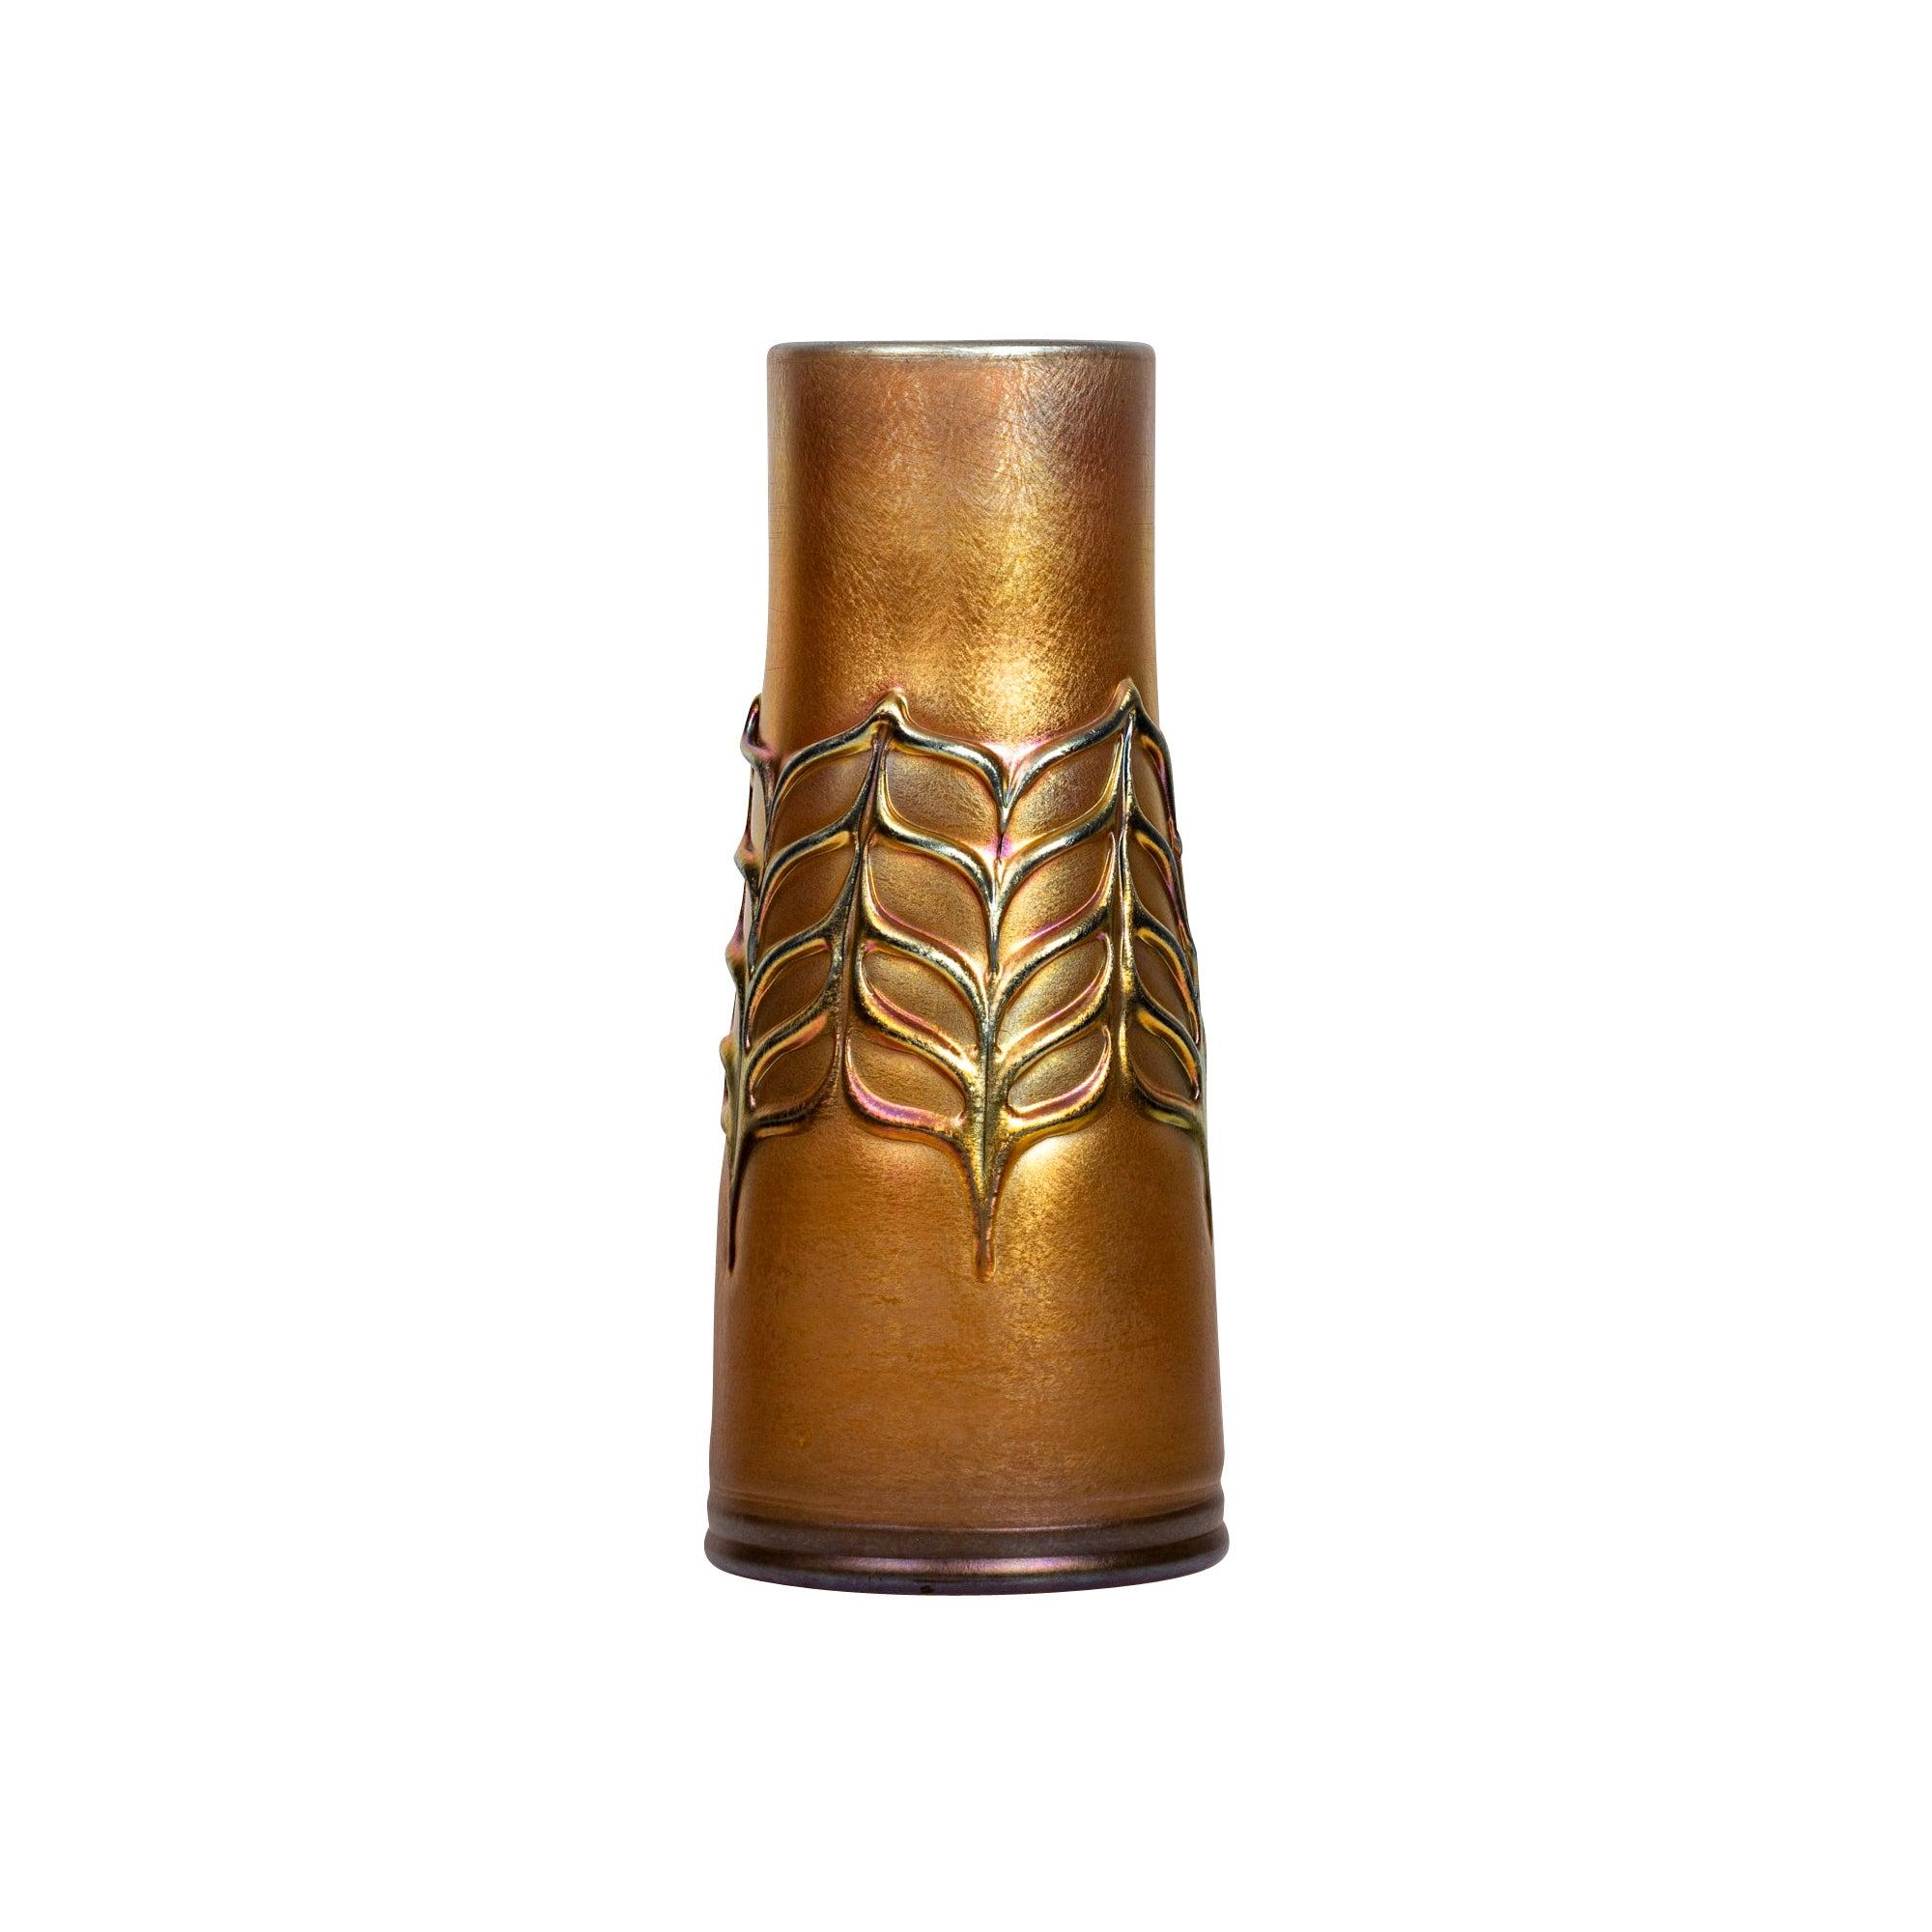 Tiffany Favrile Glass Vase